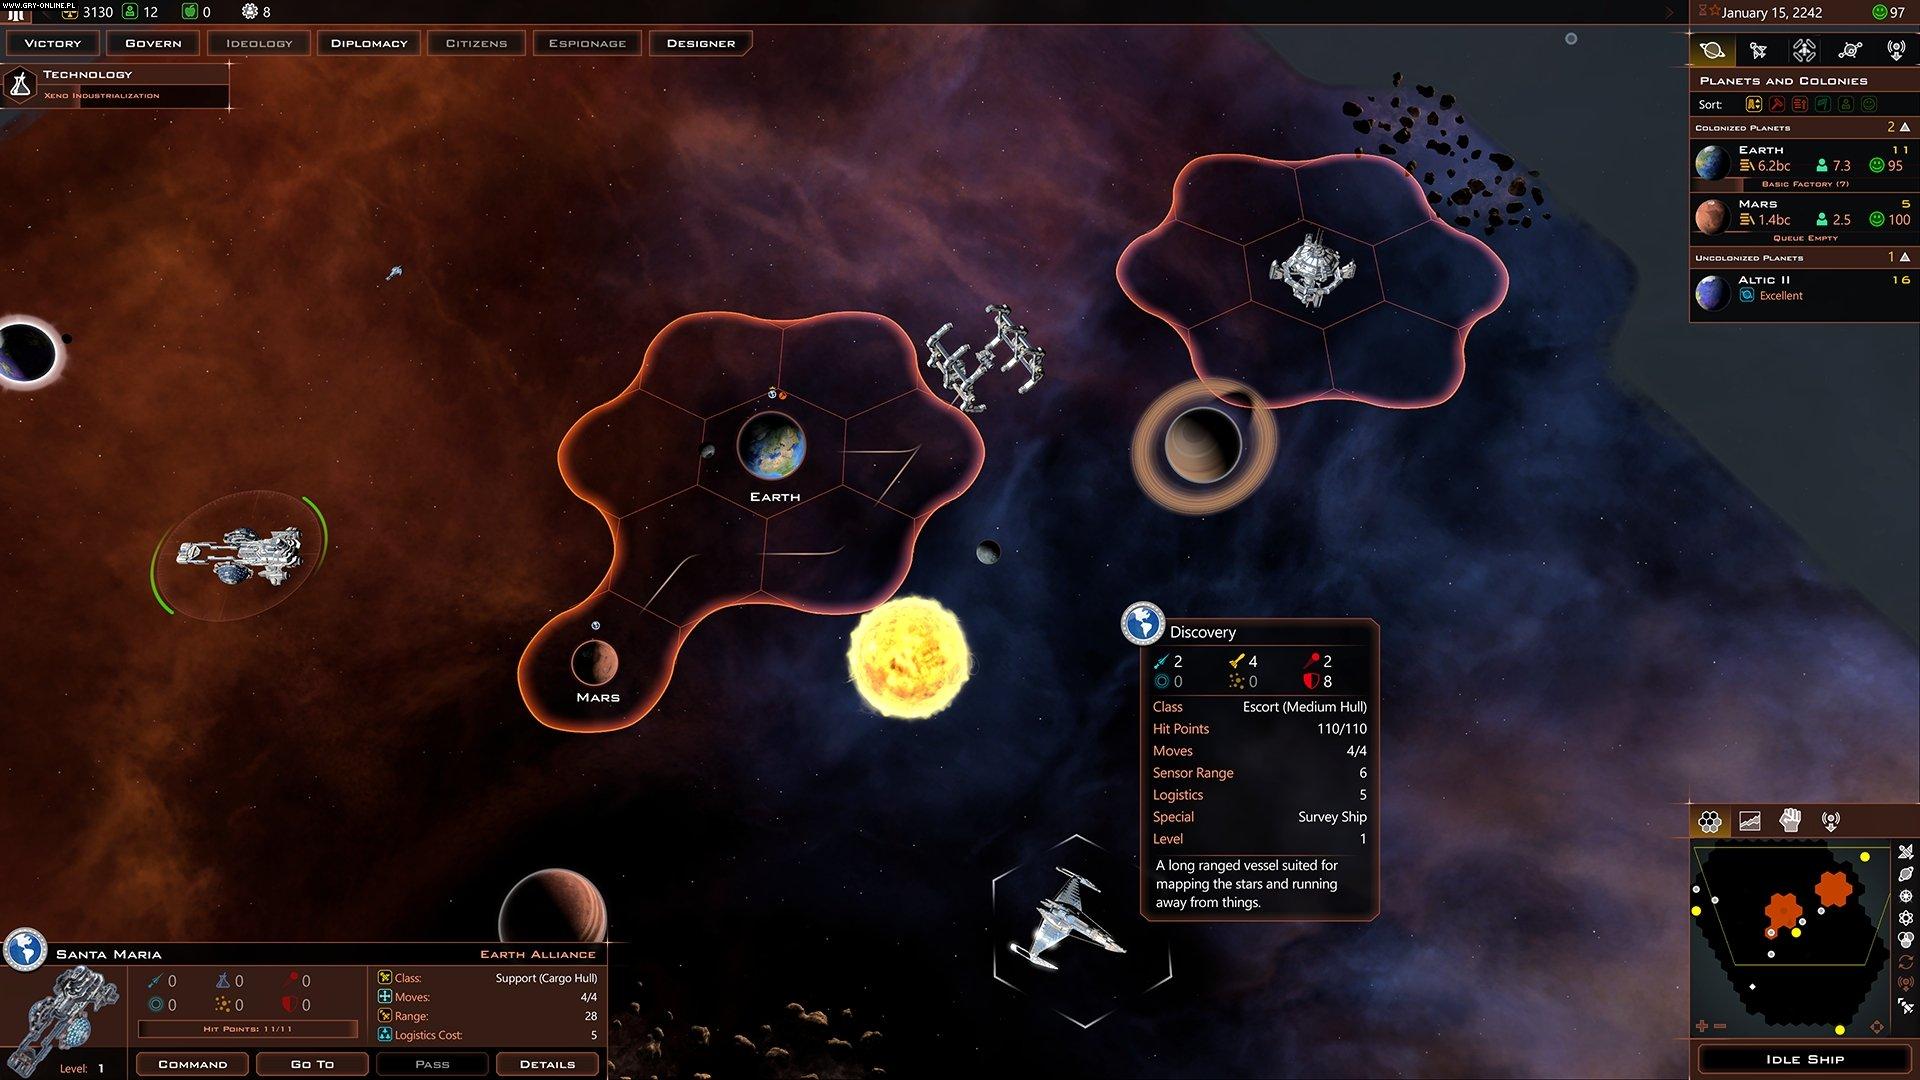 Galactic Civilizations III: Crusade PC Games Image 4/4, Stardock Corporation